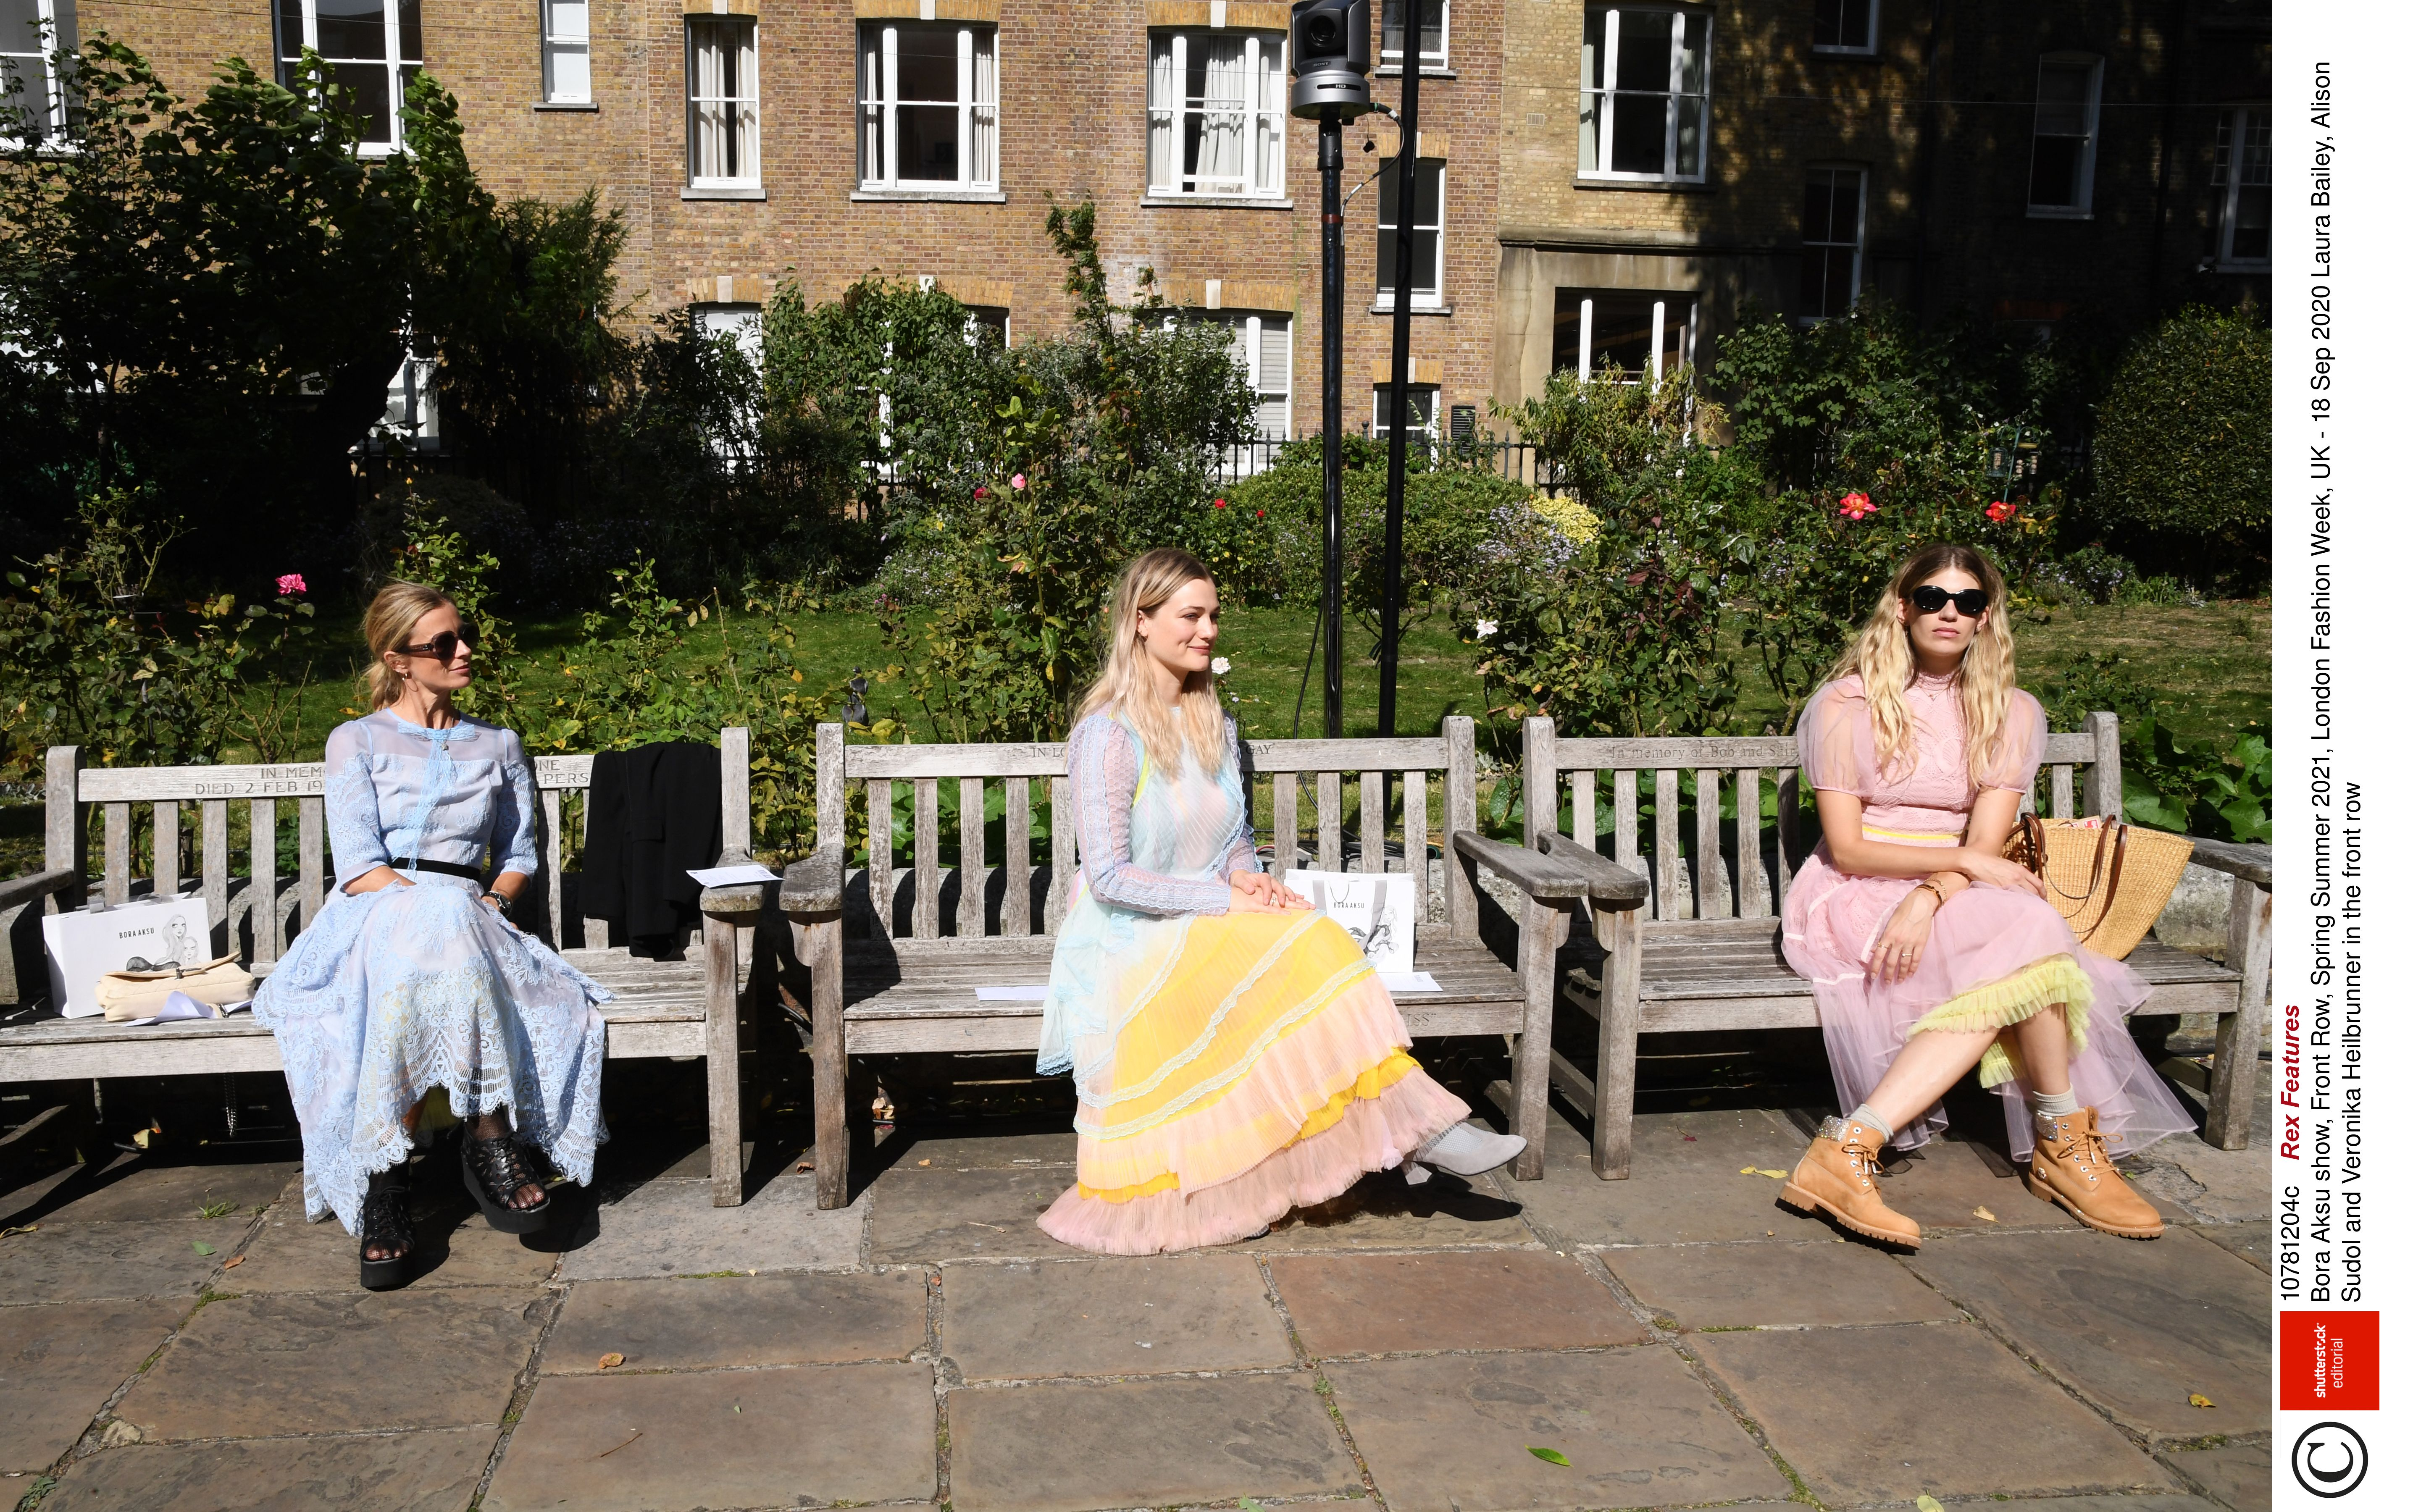 Guests attend the Bora Aksu SS21 fashion show in London